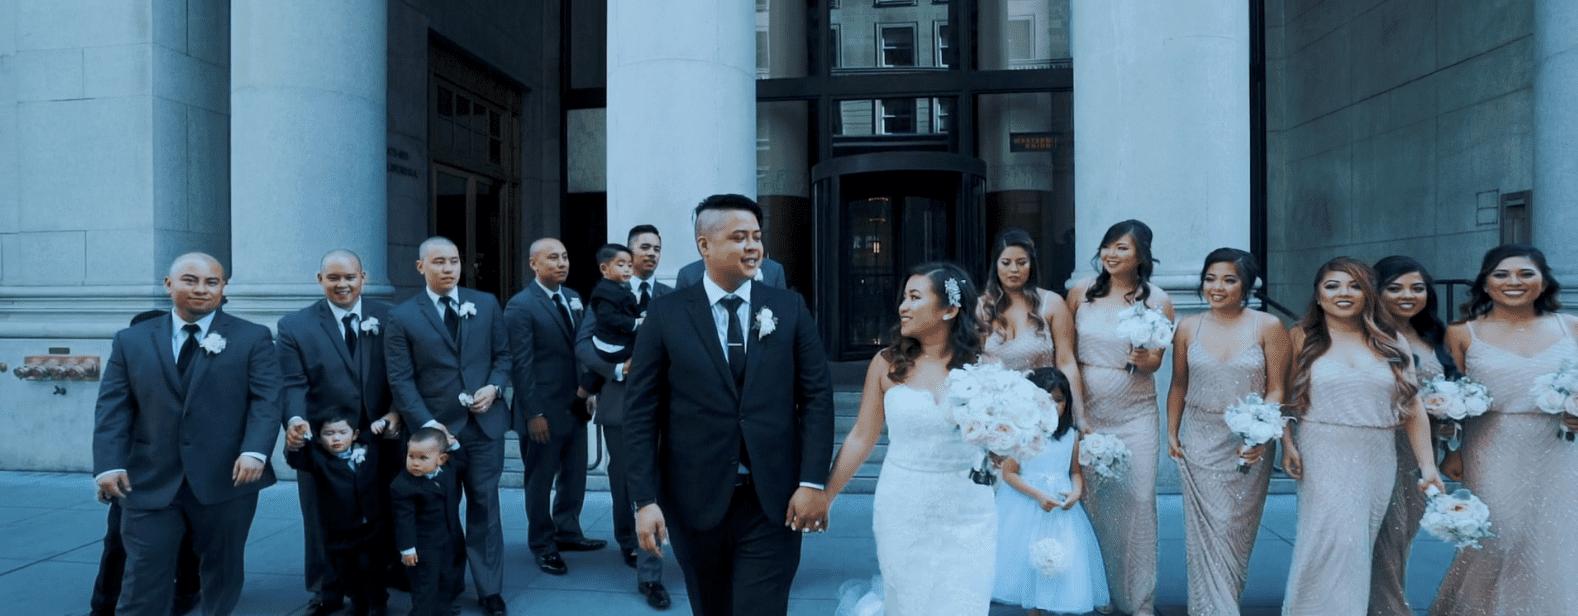 sf wedding cinematographer